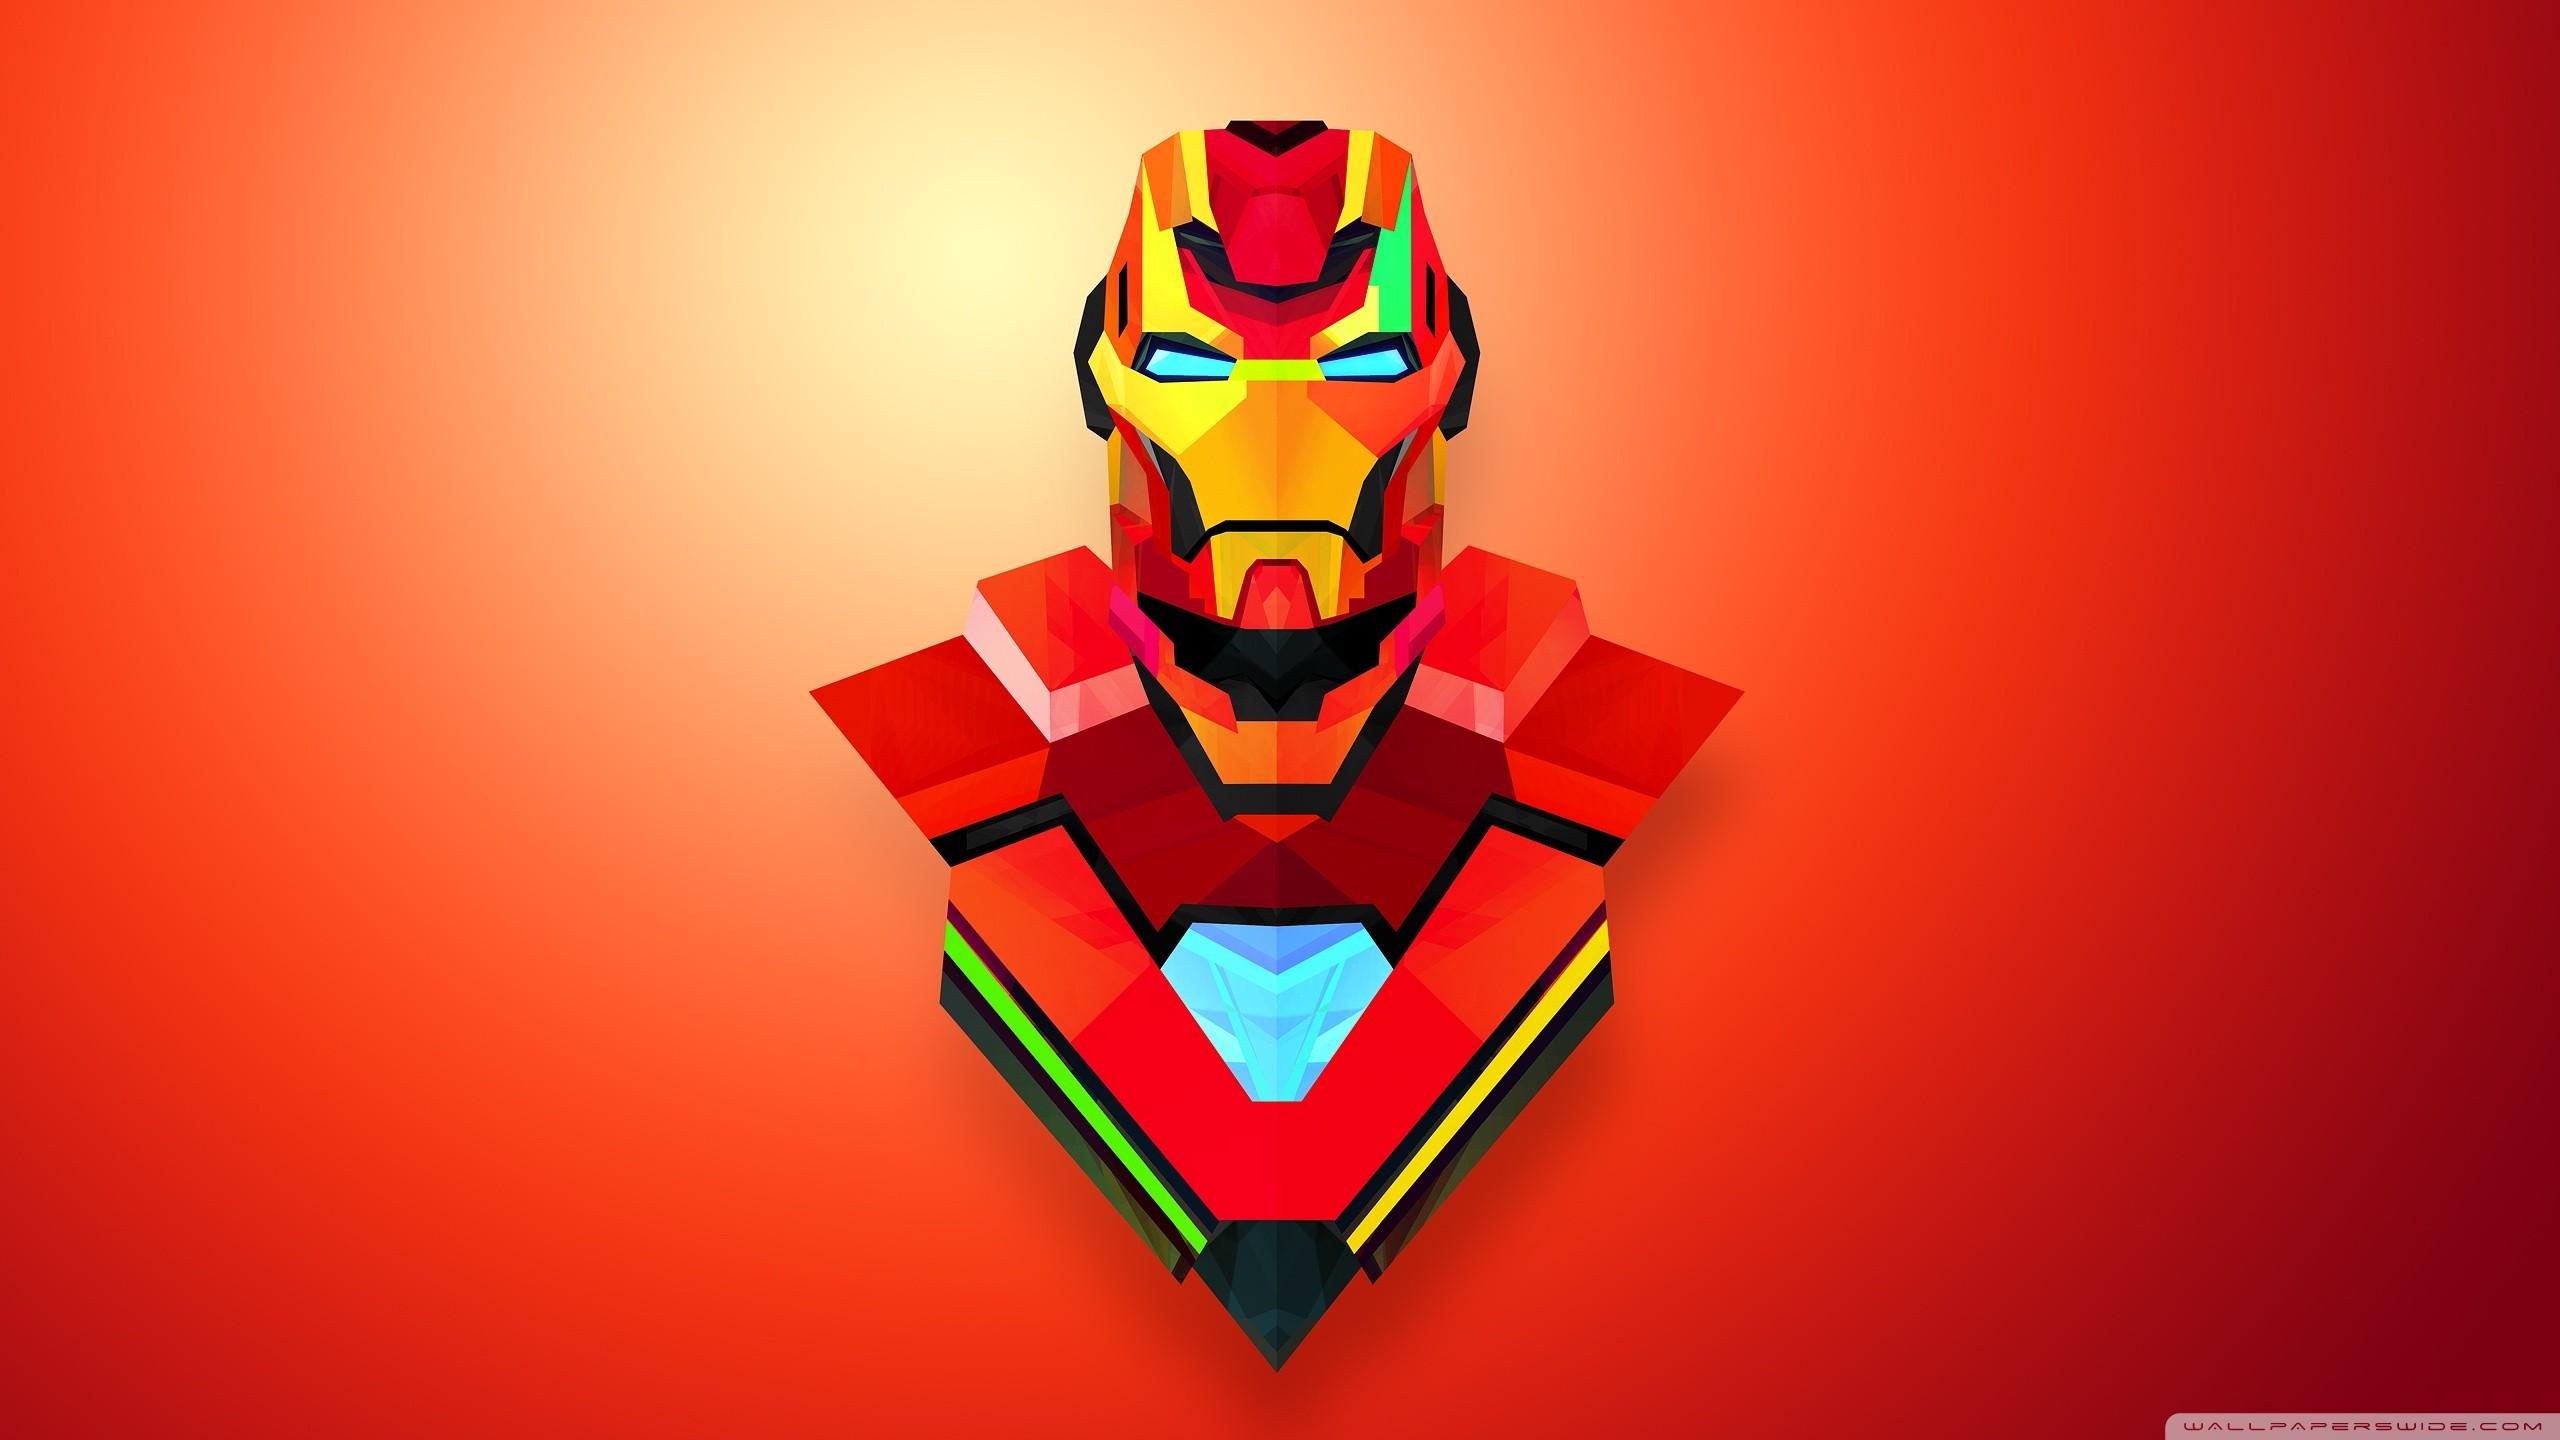 Wonderful Wallpaper Macbook Iron Man - 401361-ironman-wallpaper-2560x1440-ipad  2018_955617.jpg